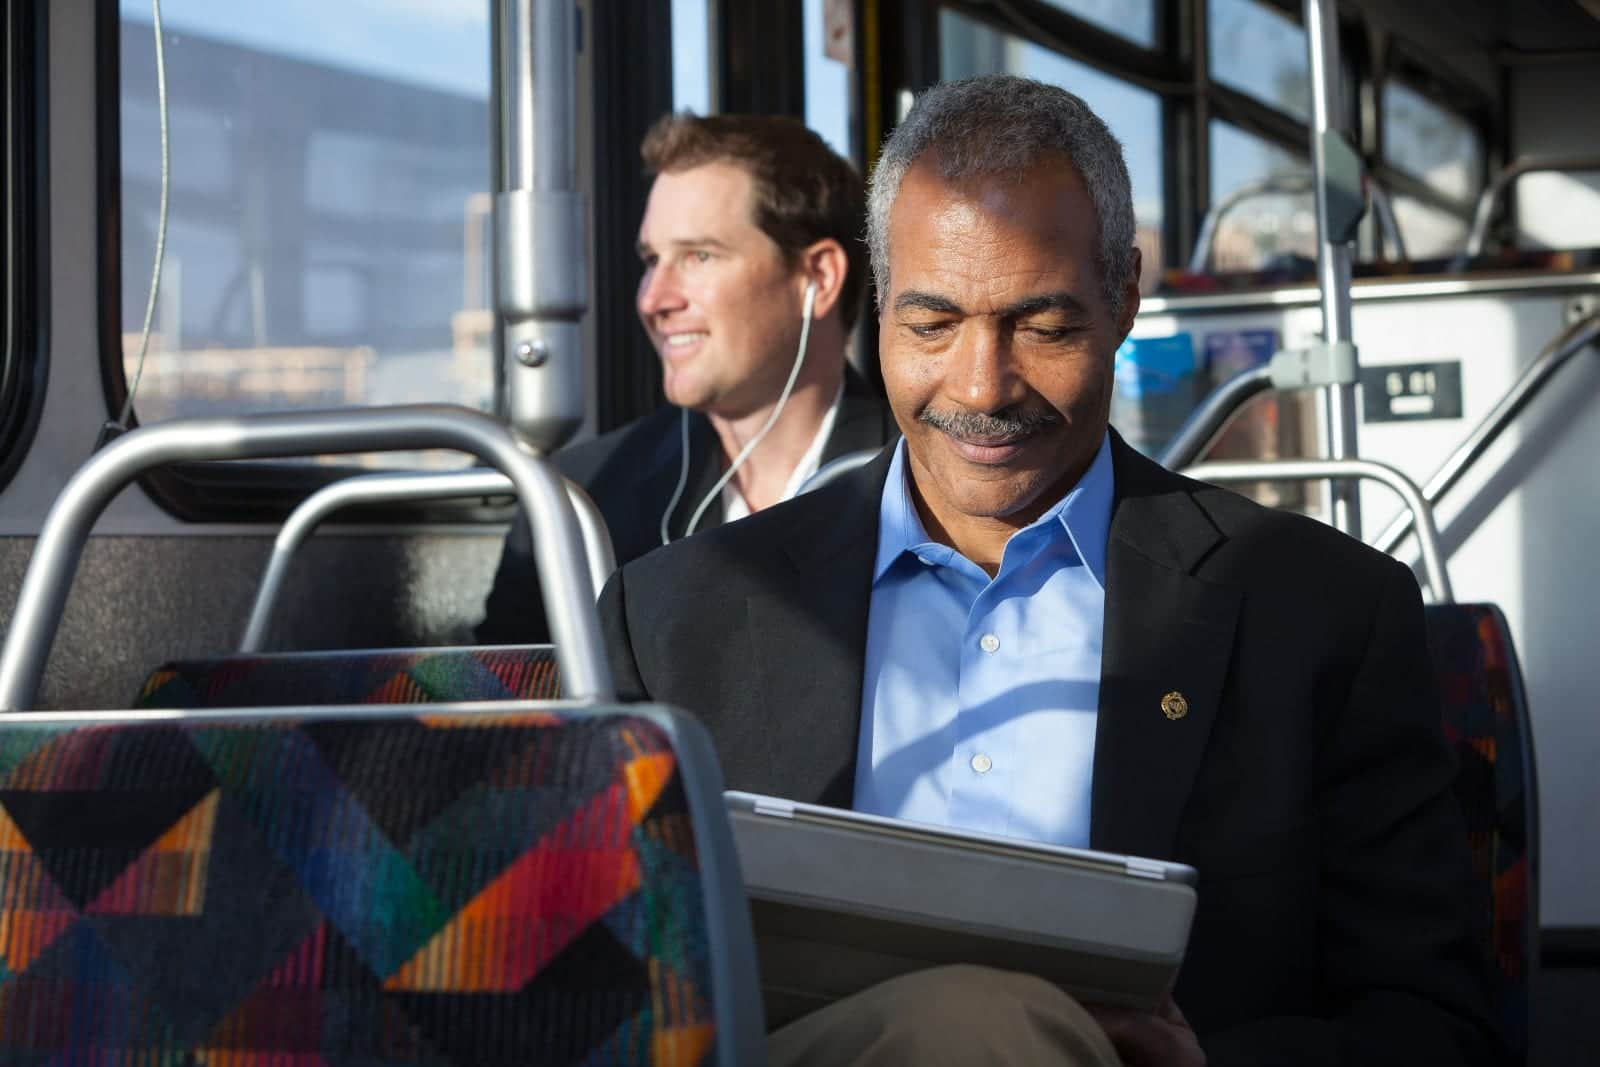 RTD Bus Riders On-Board Passengers